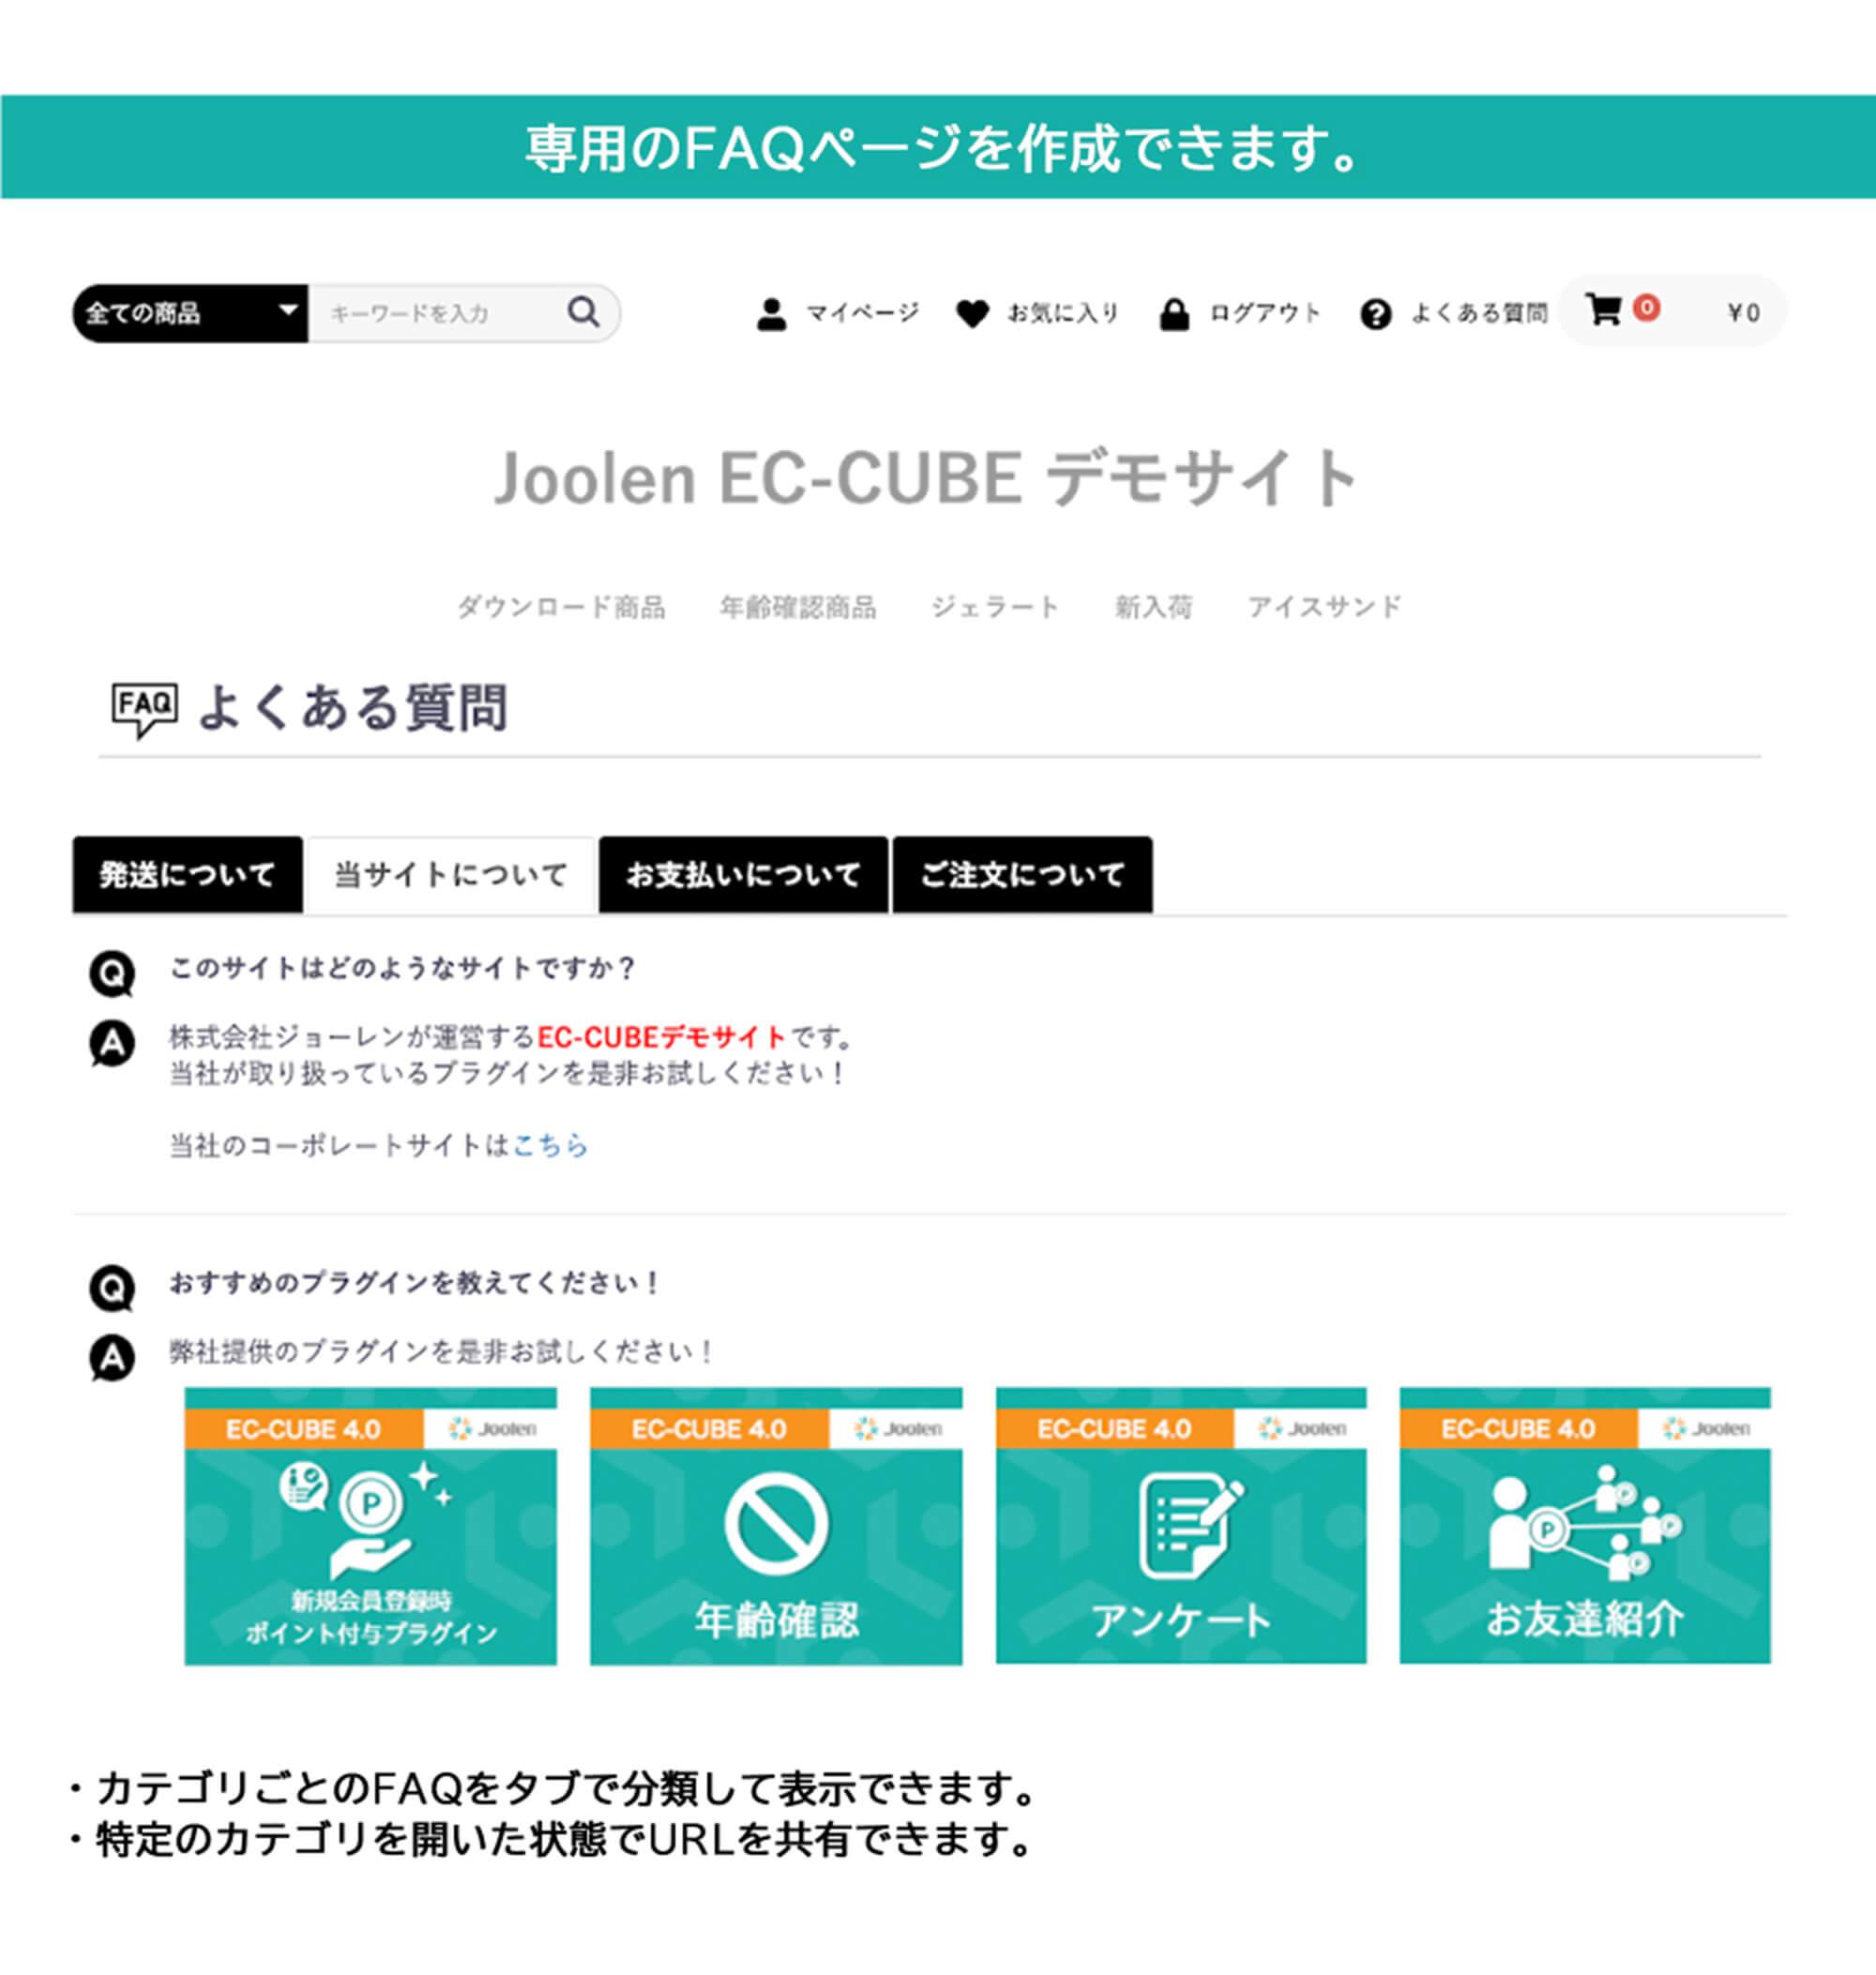 FAQページ追加プラグイン for EC-CUBE 4.0